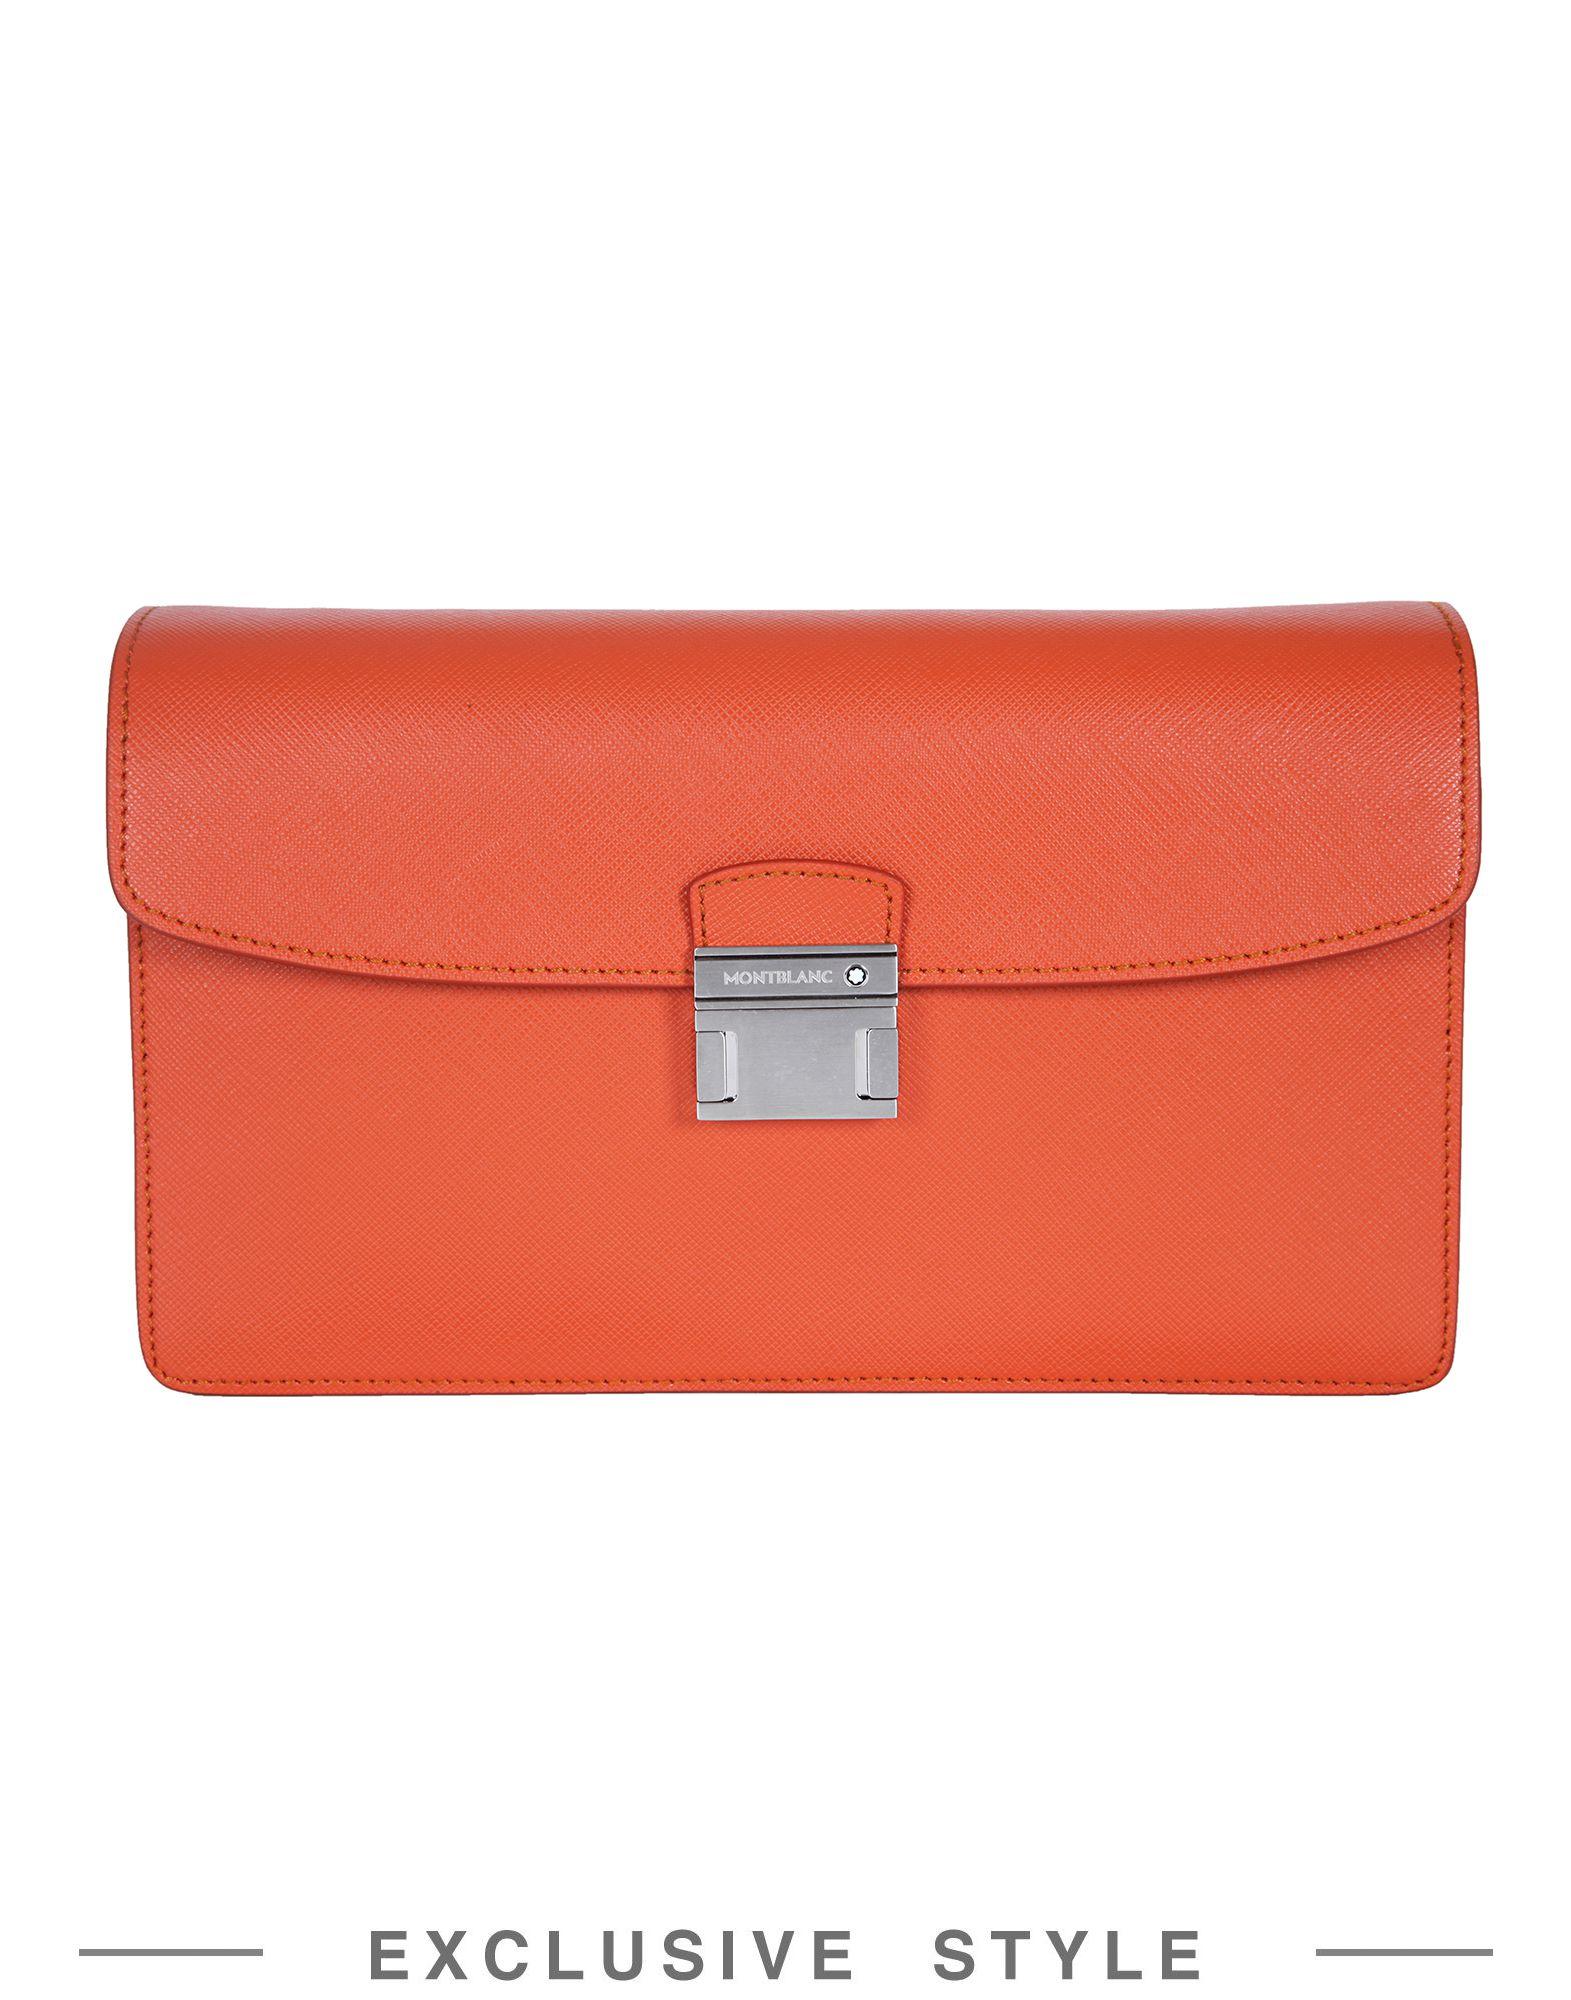 MONTBLANC x YOOX Work Bags